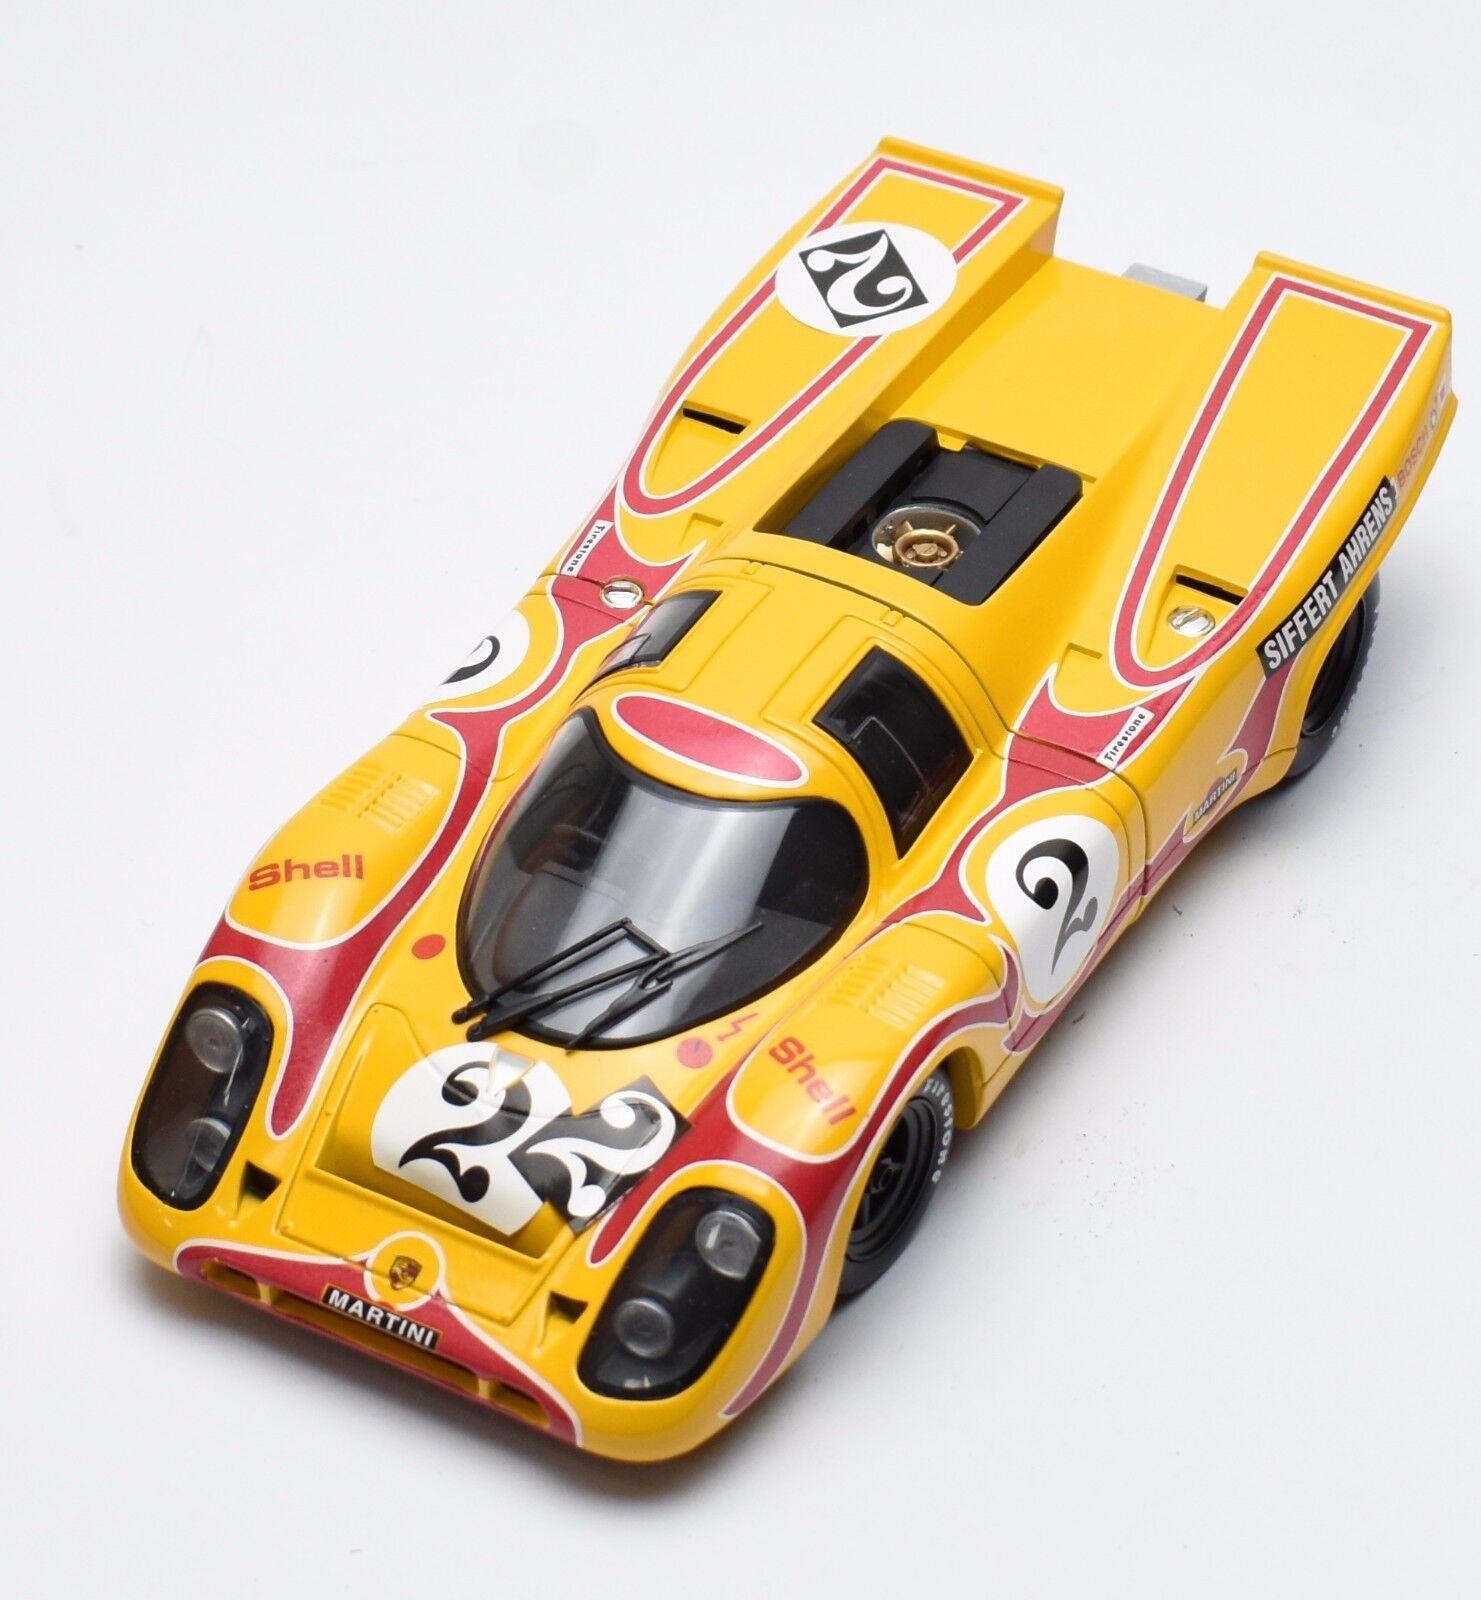 Universal Hobbies Porsche 917k Hours Kyalami, Siffert amrens  2, 1 18, x003